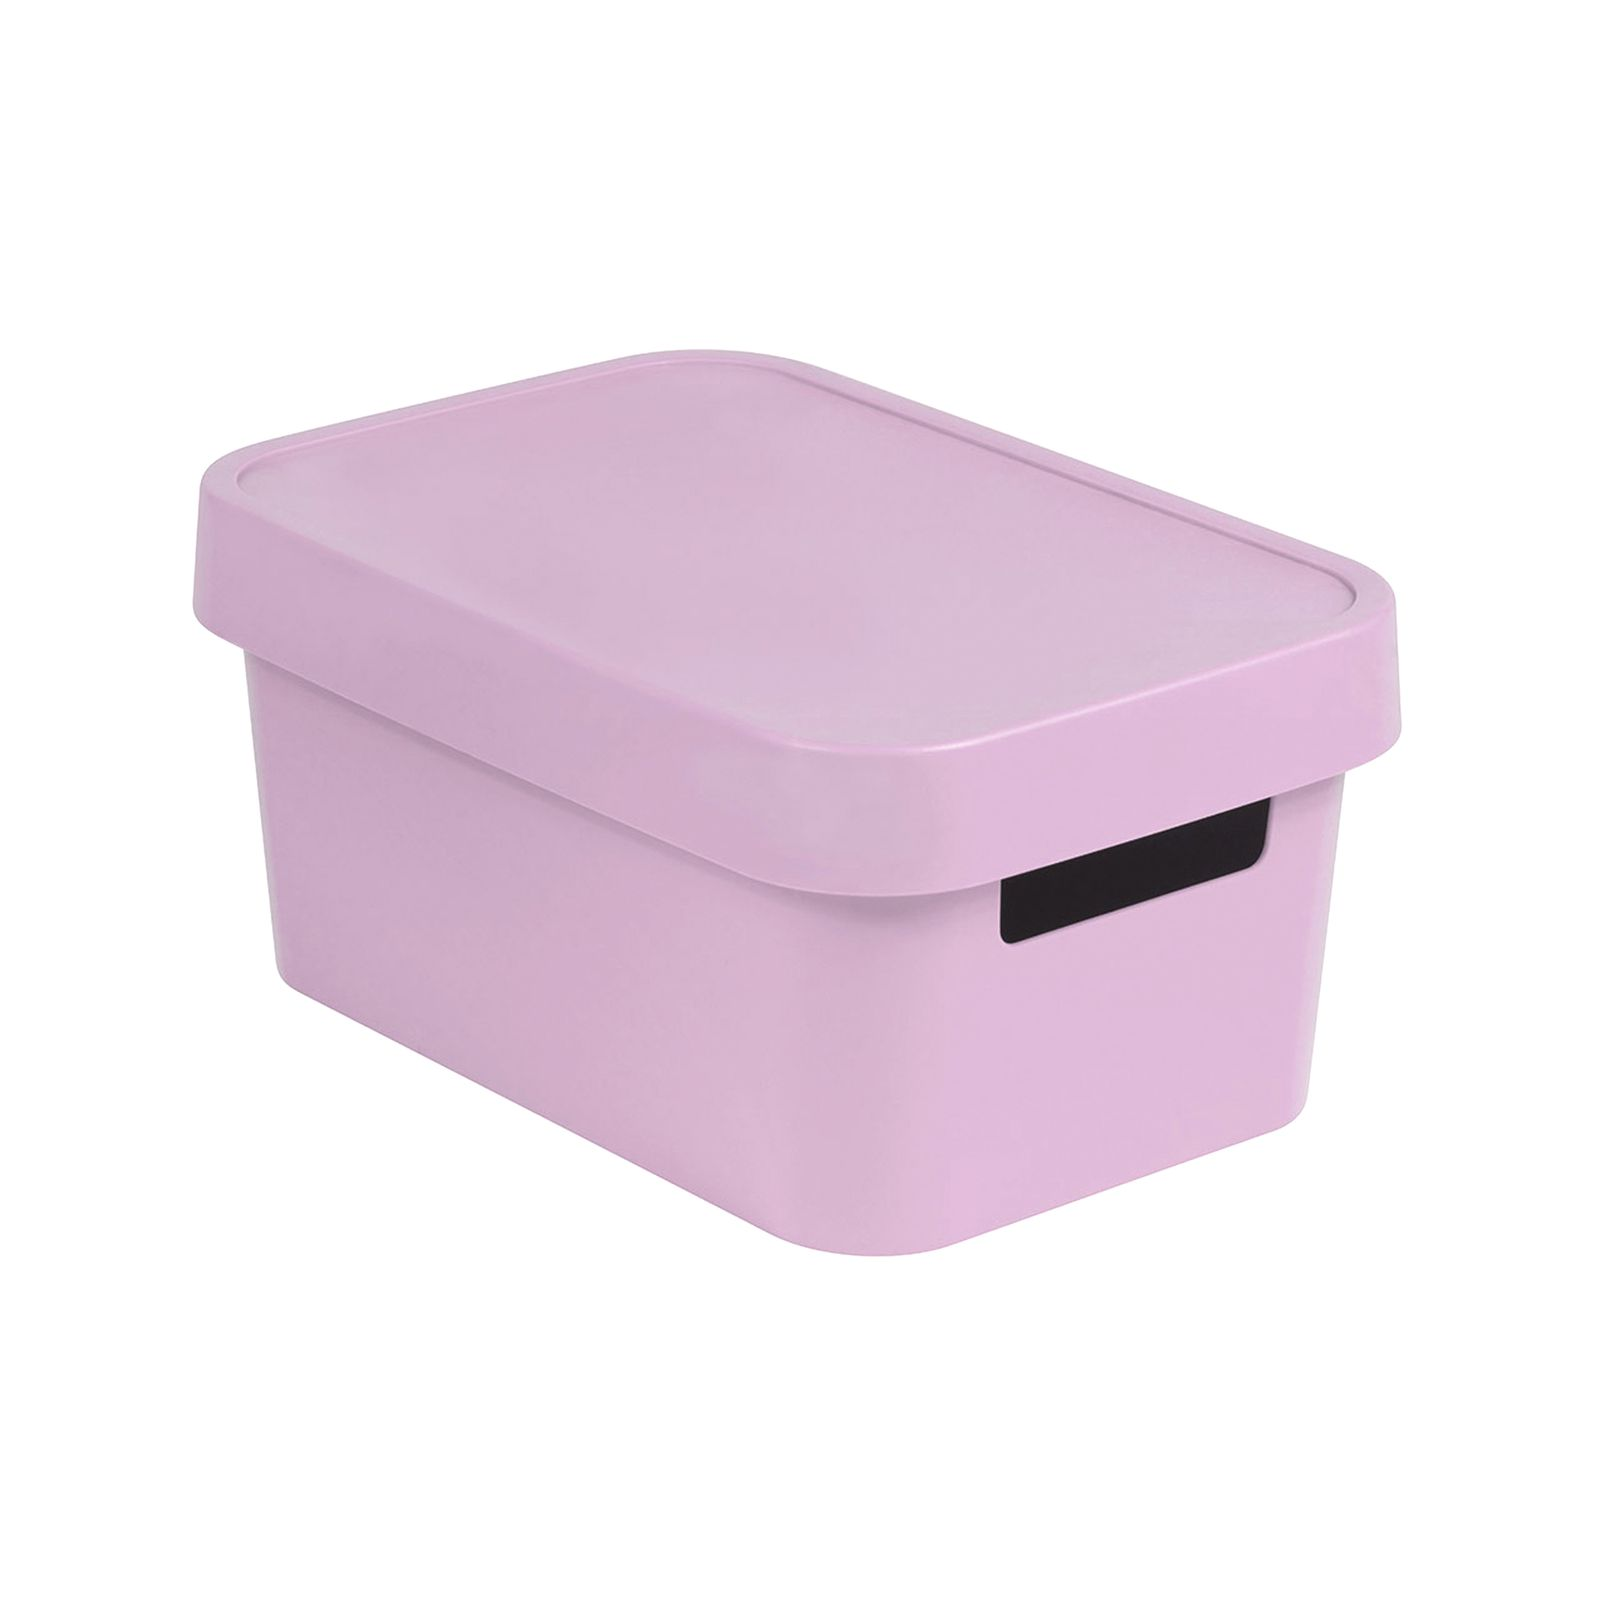 Caja con tapa Infinity rosa 27 x 19 x 12 cm CURVER